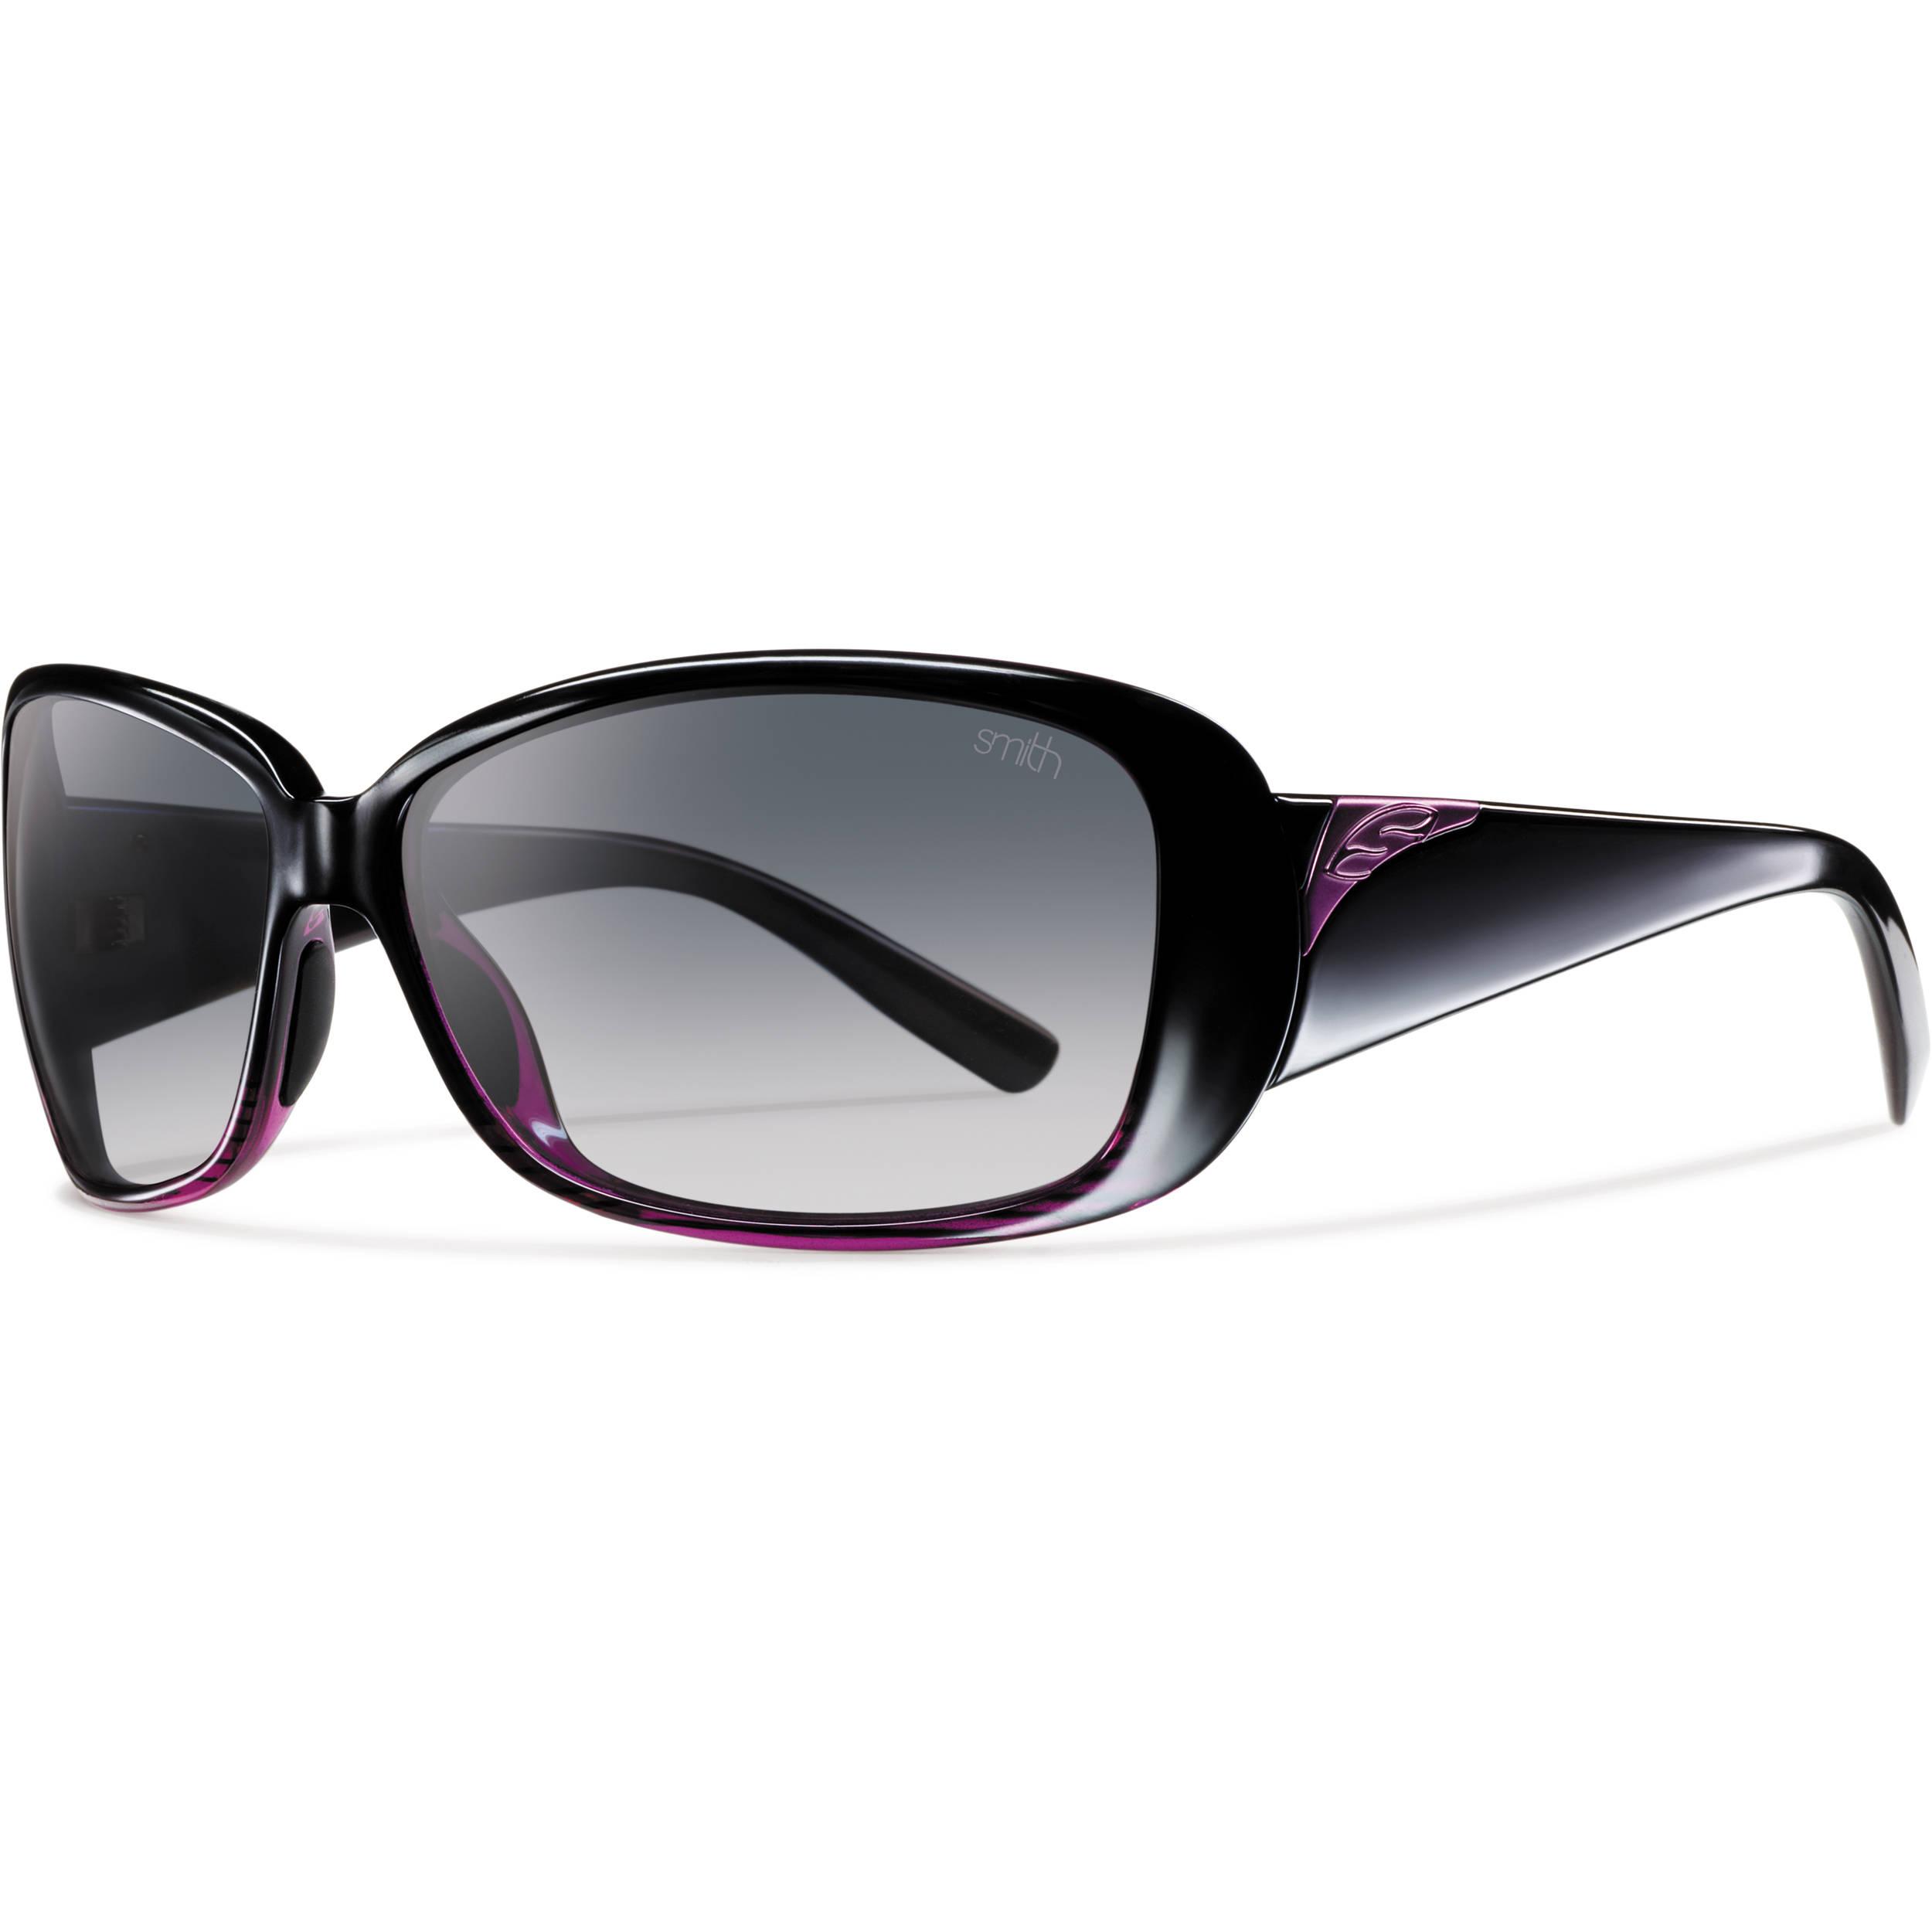 Tlt dividida degradado Optics polarizada negro Smith sol Gafas mujer para gris de Shorewood violeta 4qHAzpwO